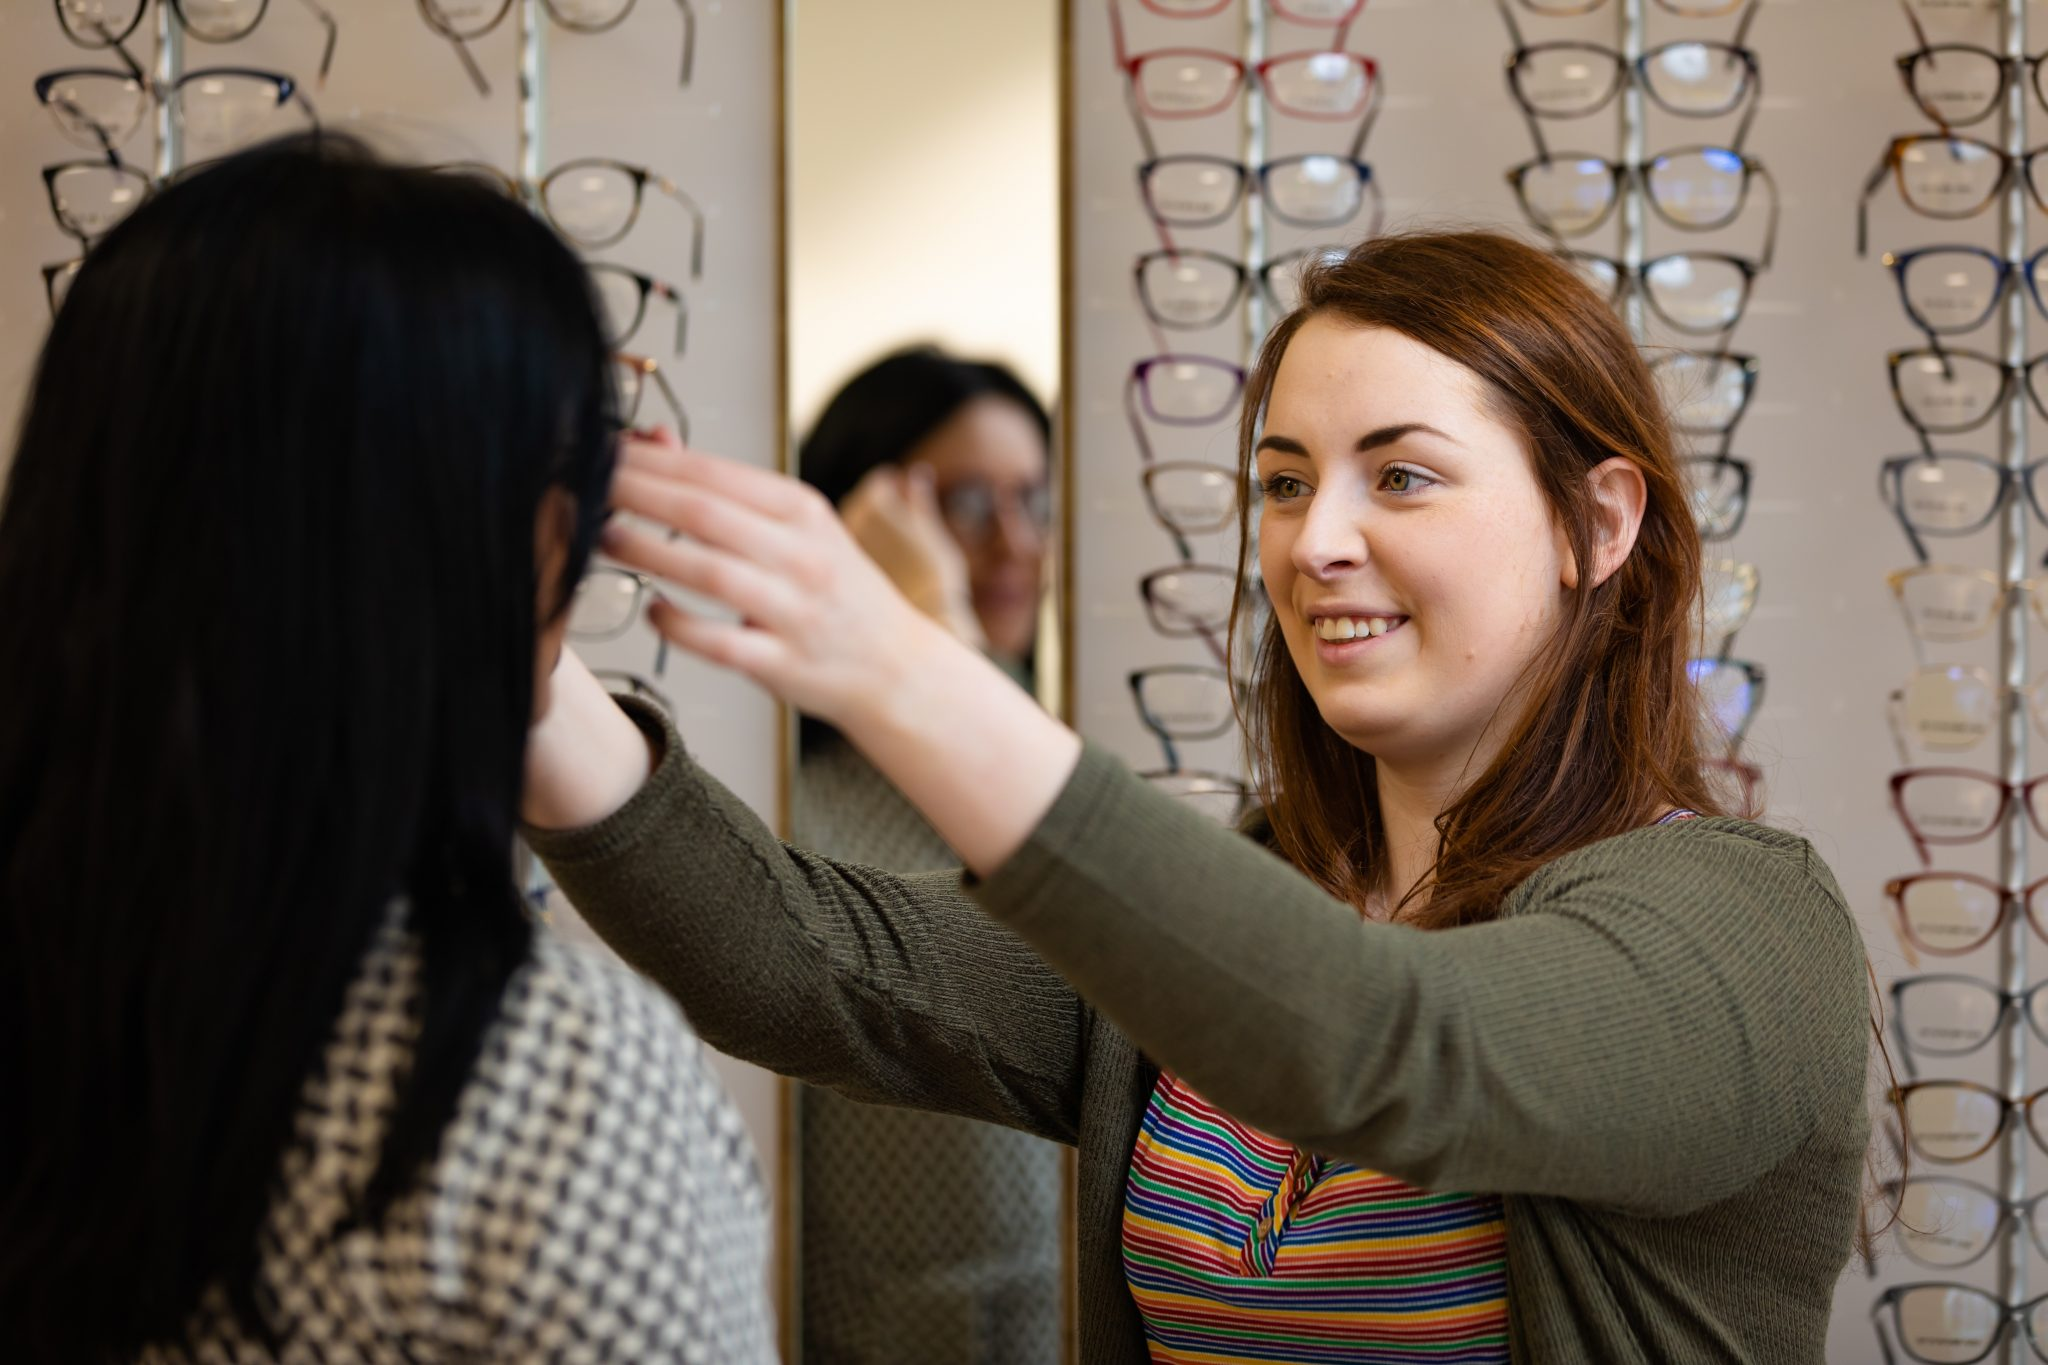 Independent Opticians, based in Stephen Street, Sligo